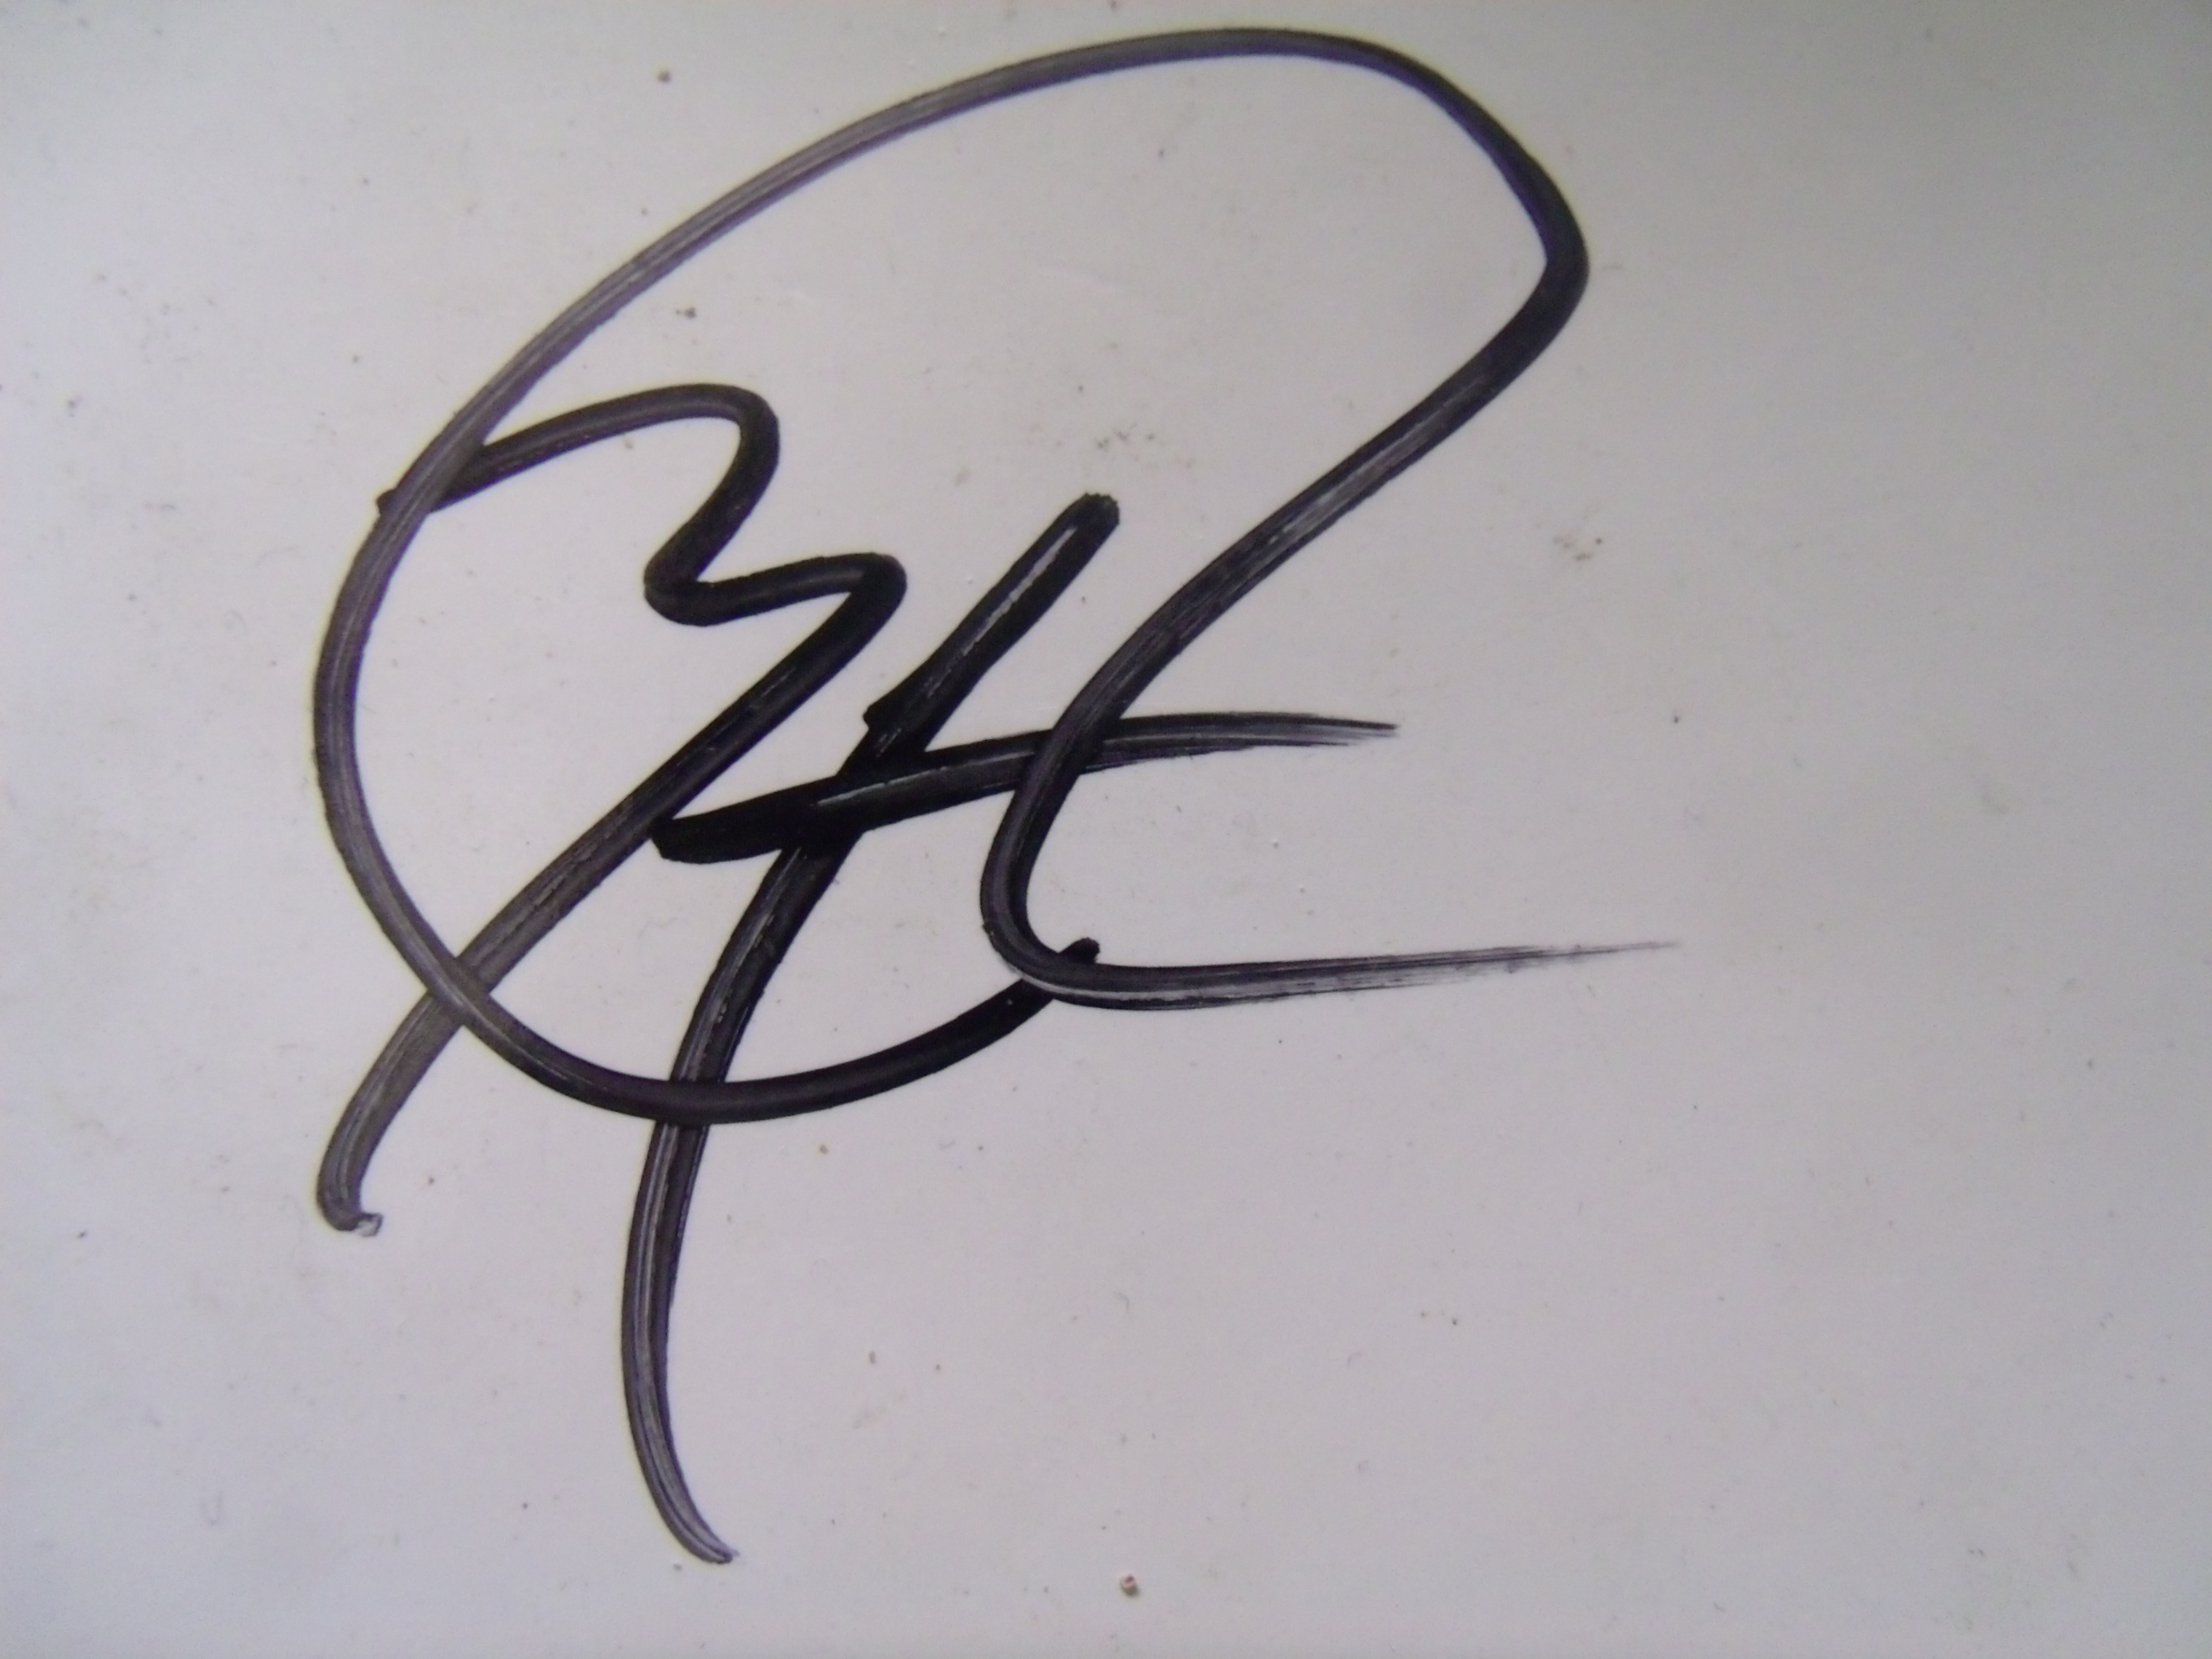 bryant tillman's Signature